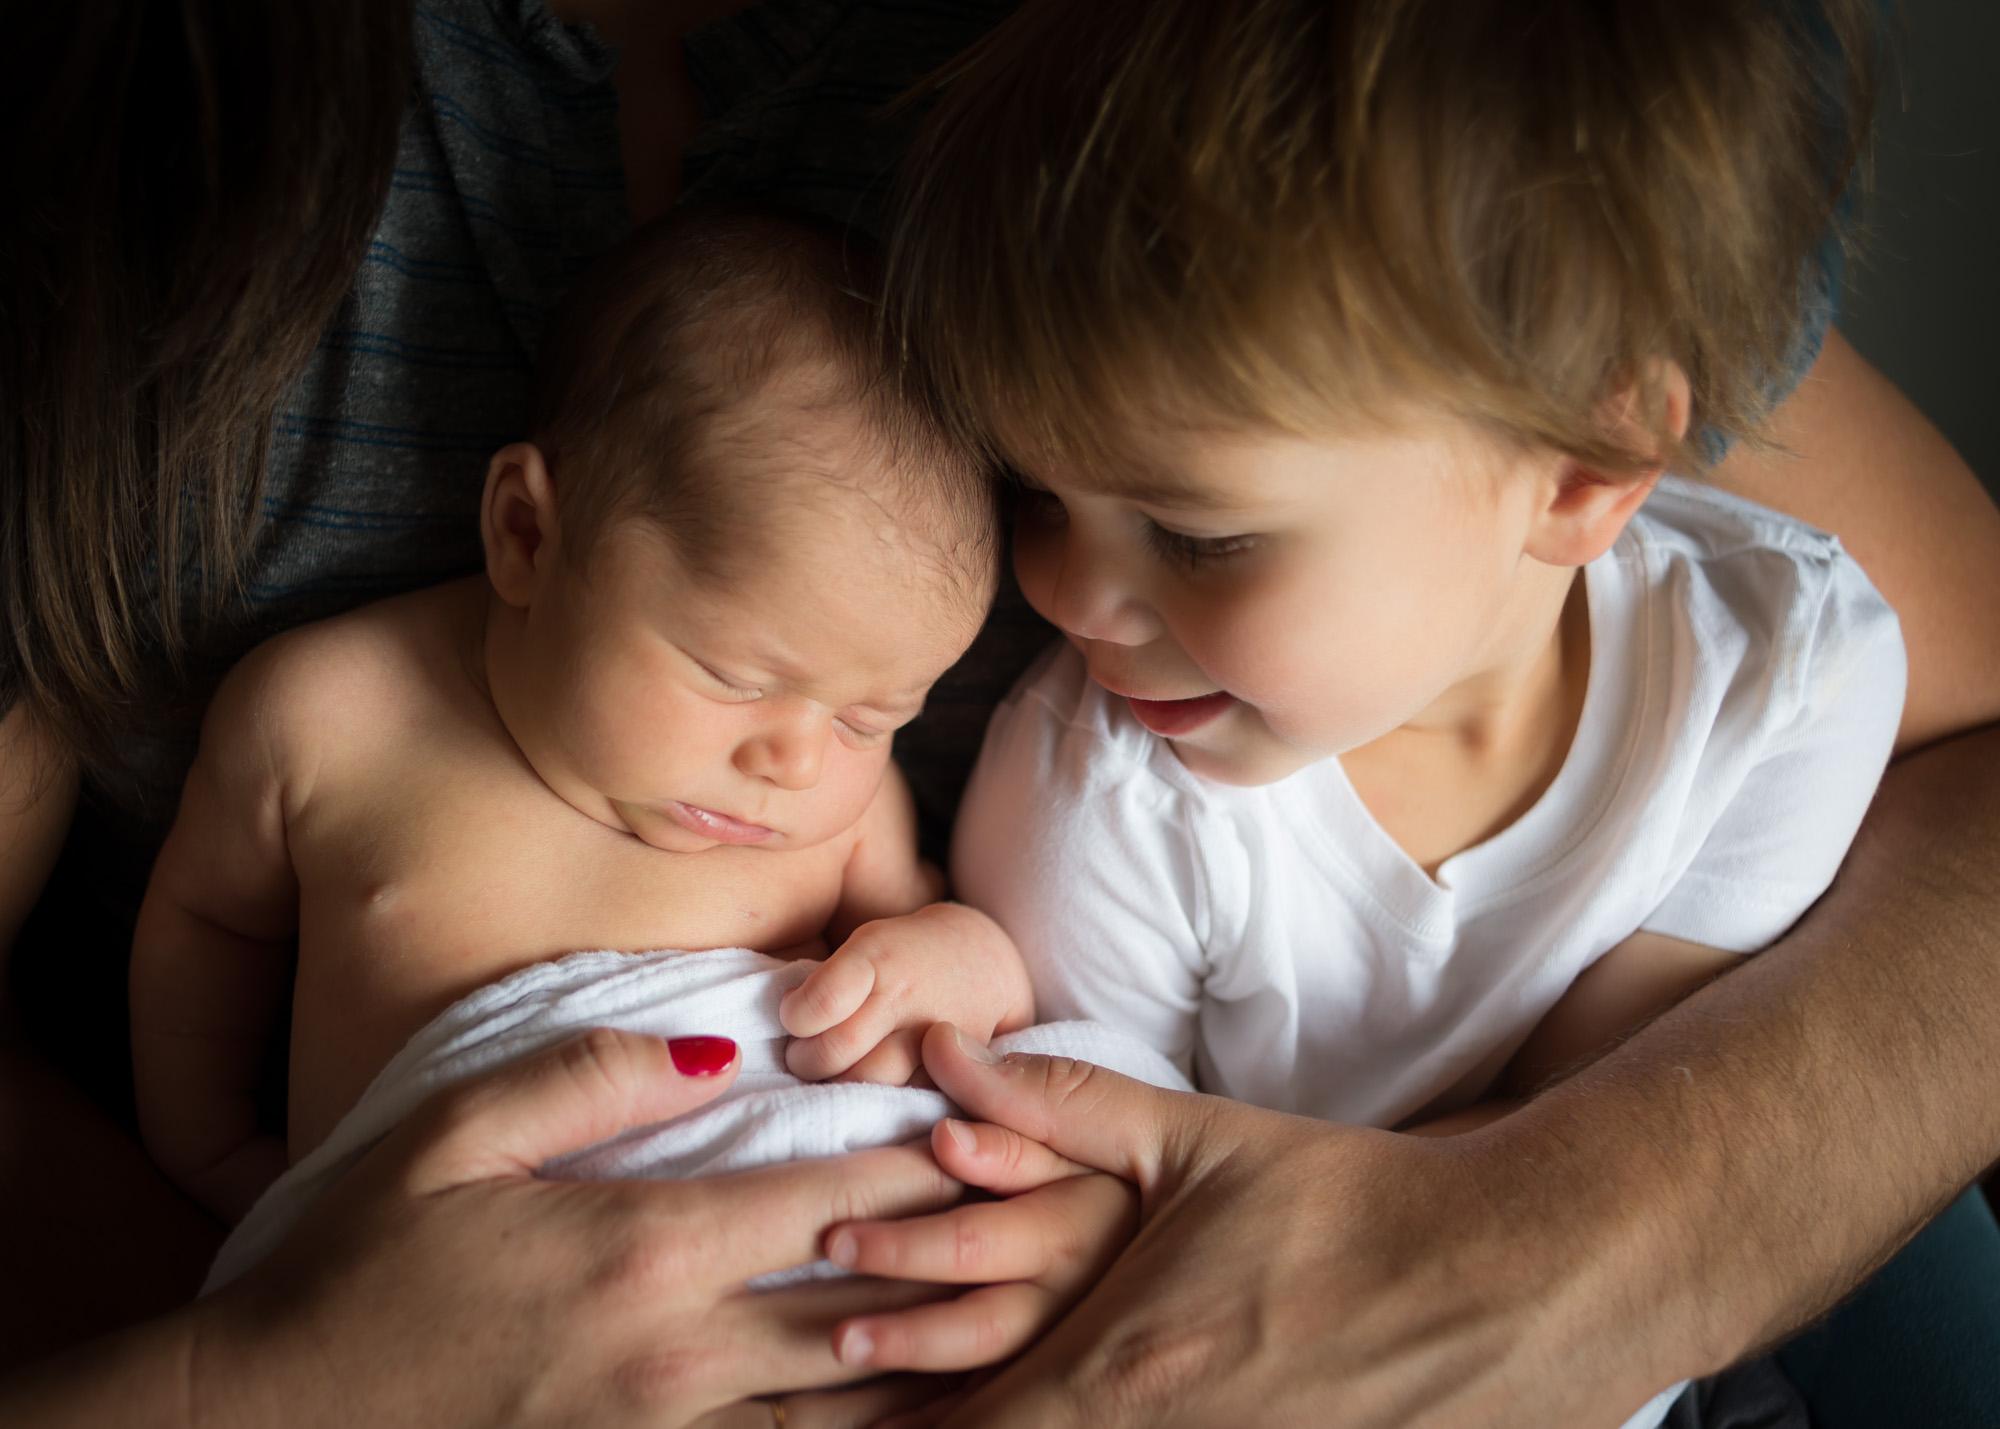 seattle-newborn-photography-session-7.jpg